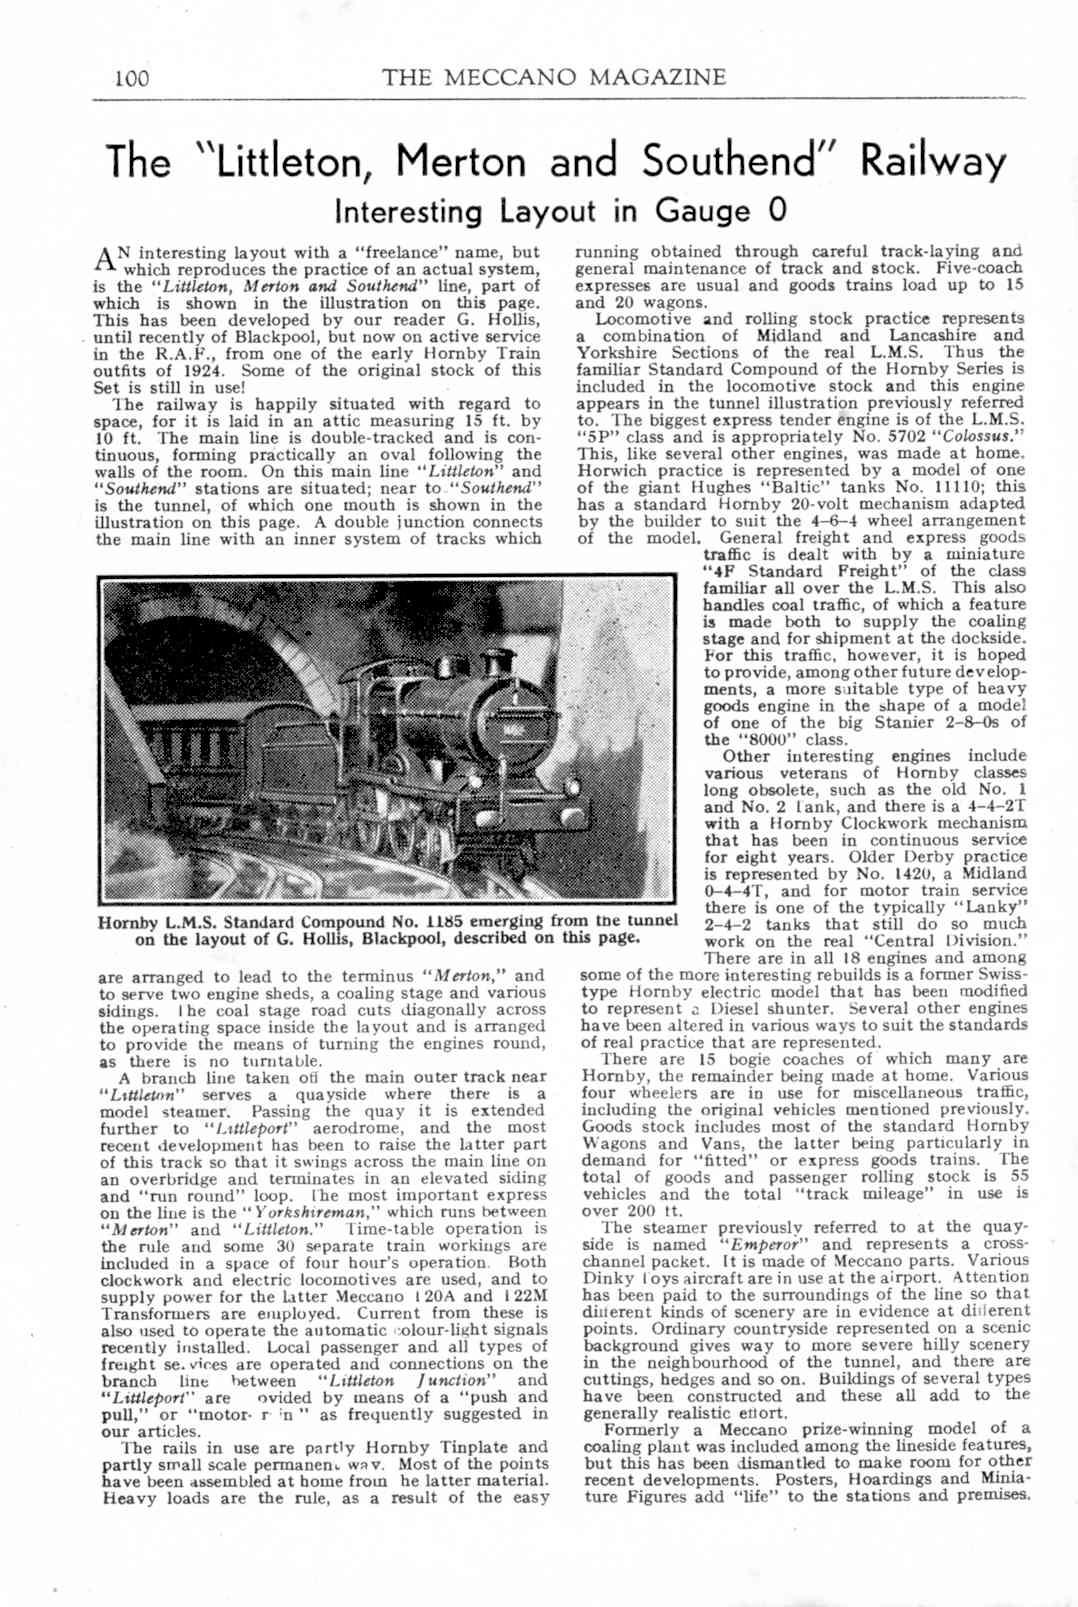 UK Meccano Magazine March 1943 Page 100